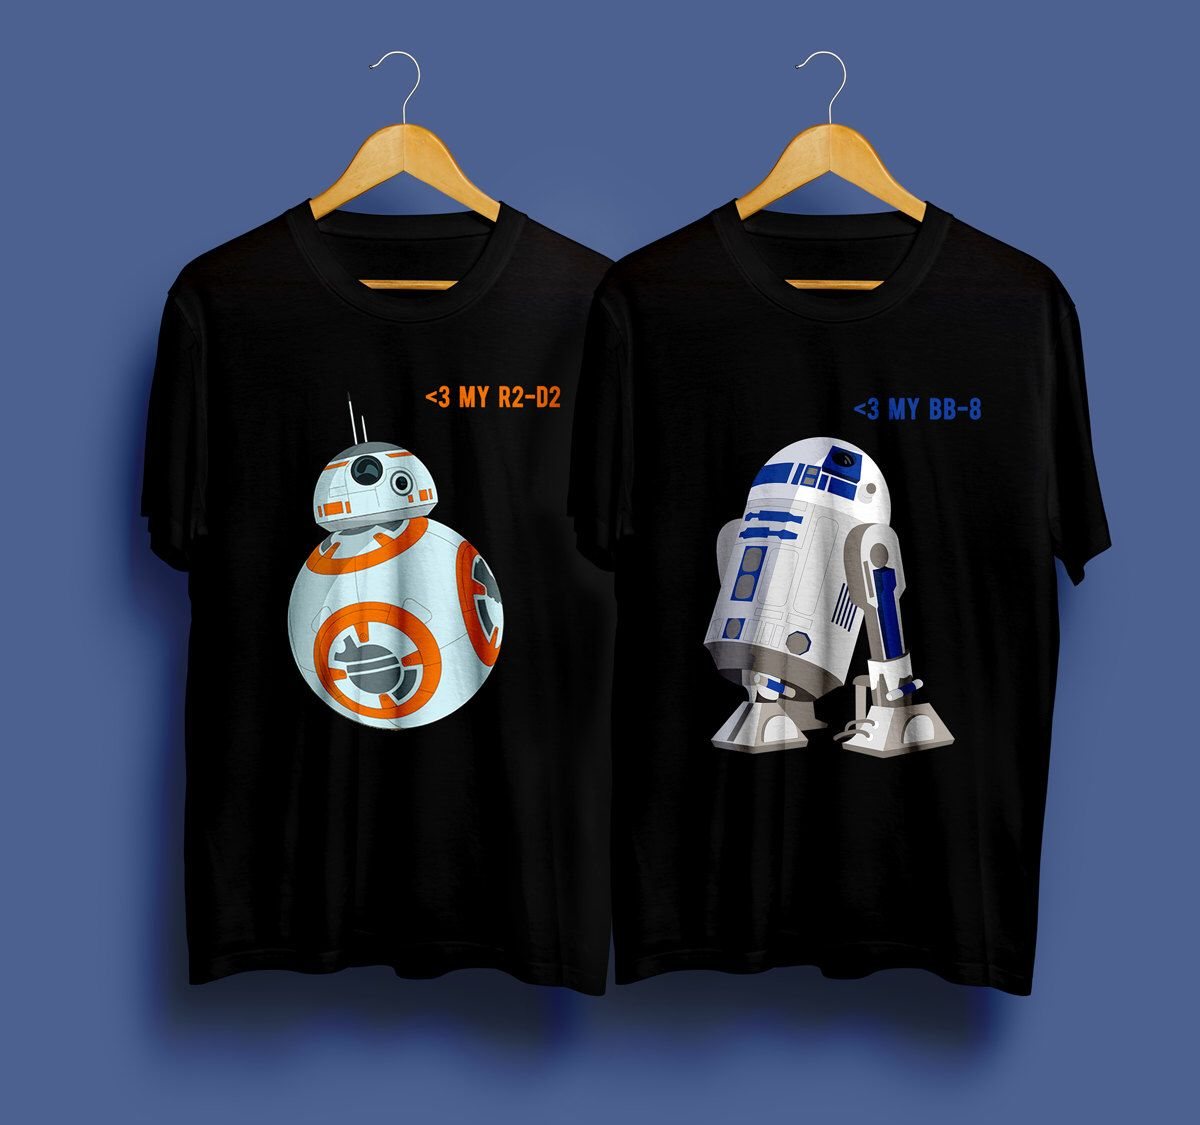 f976521f1 Star Wars Shirt Couple Tshirt Star Wars Shirt Boyfriend Girlfriend Gift  Husband Gift Couple Tee Matching